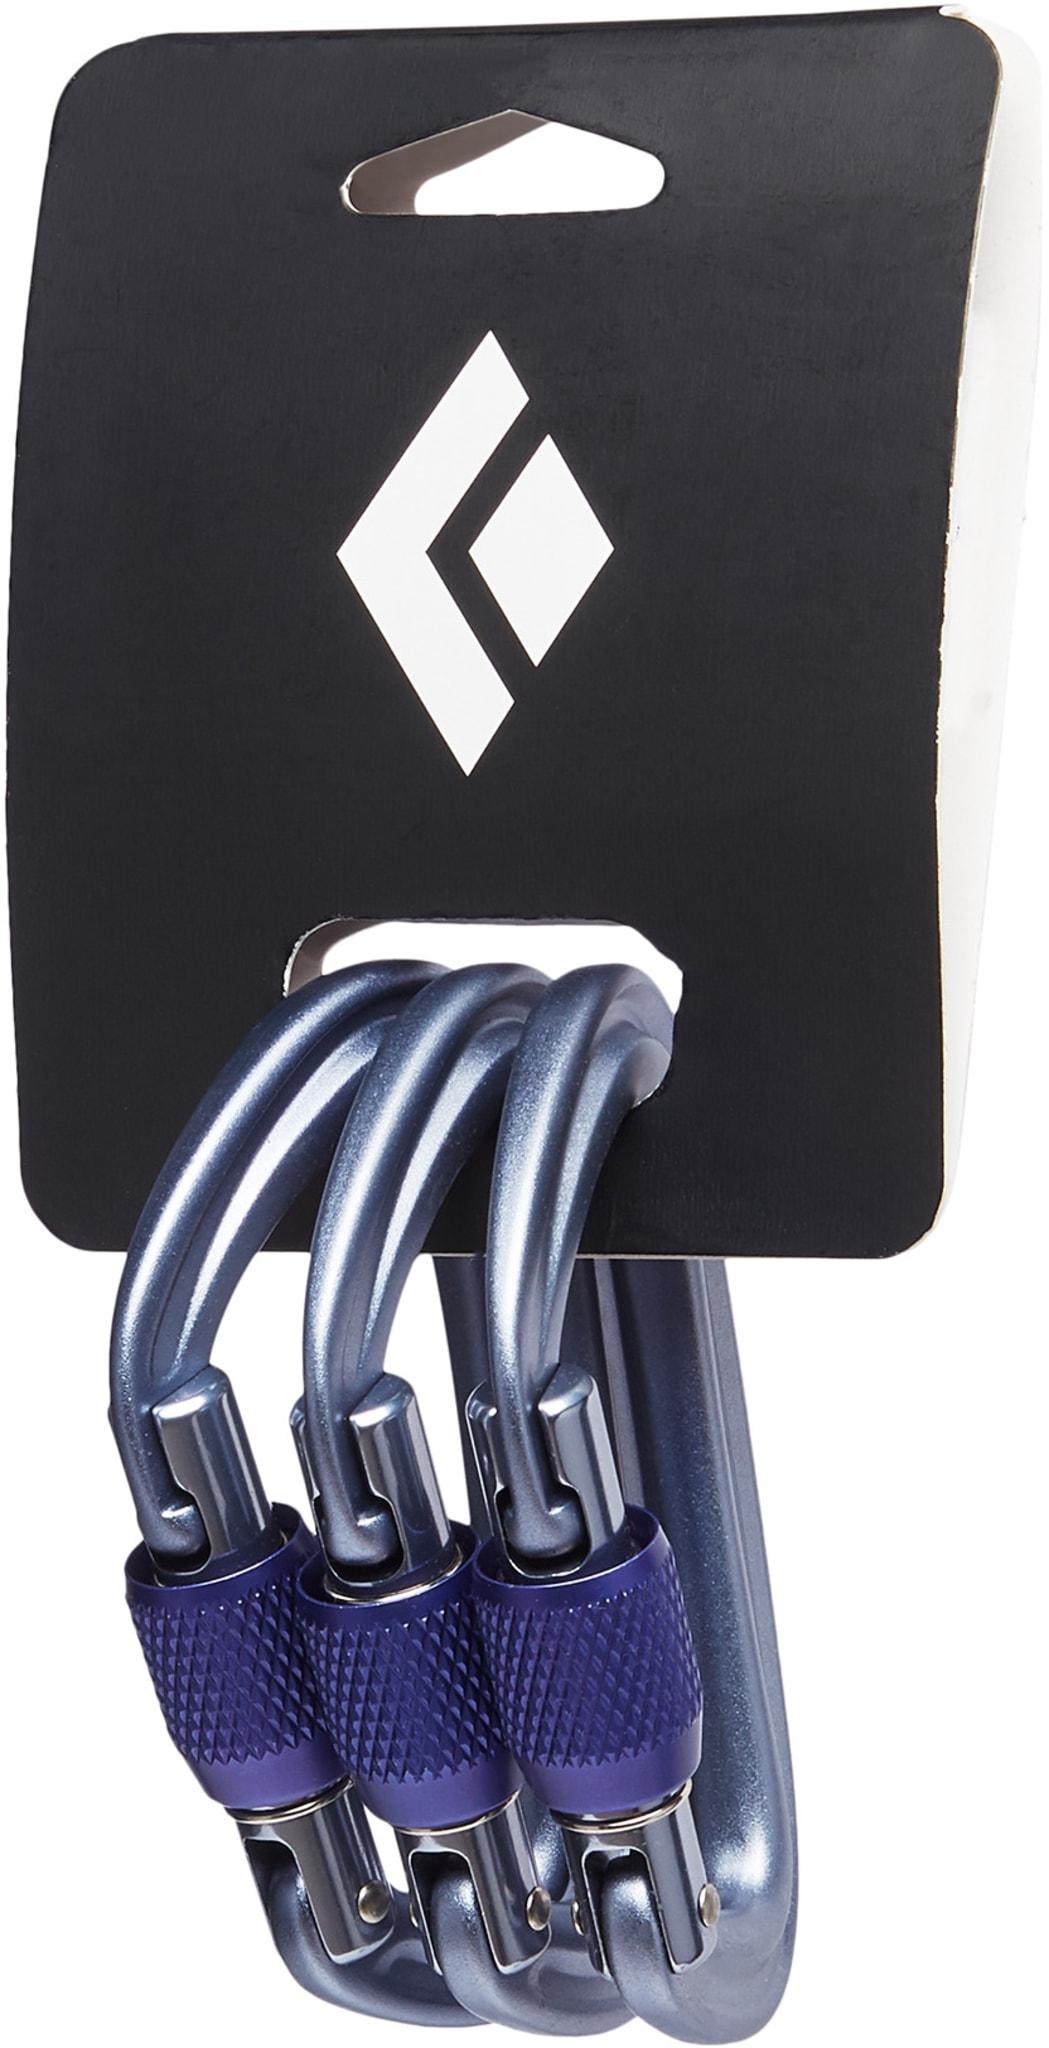 Pakke med 3 stk LiteForge Screwgate